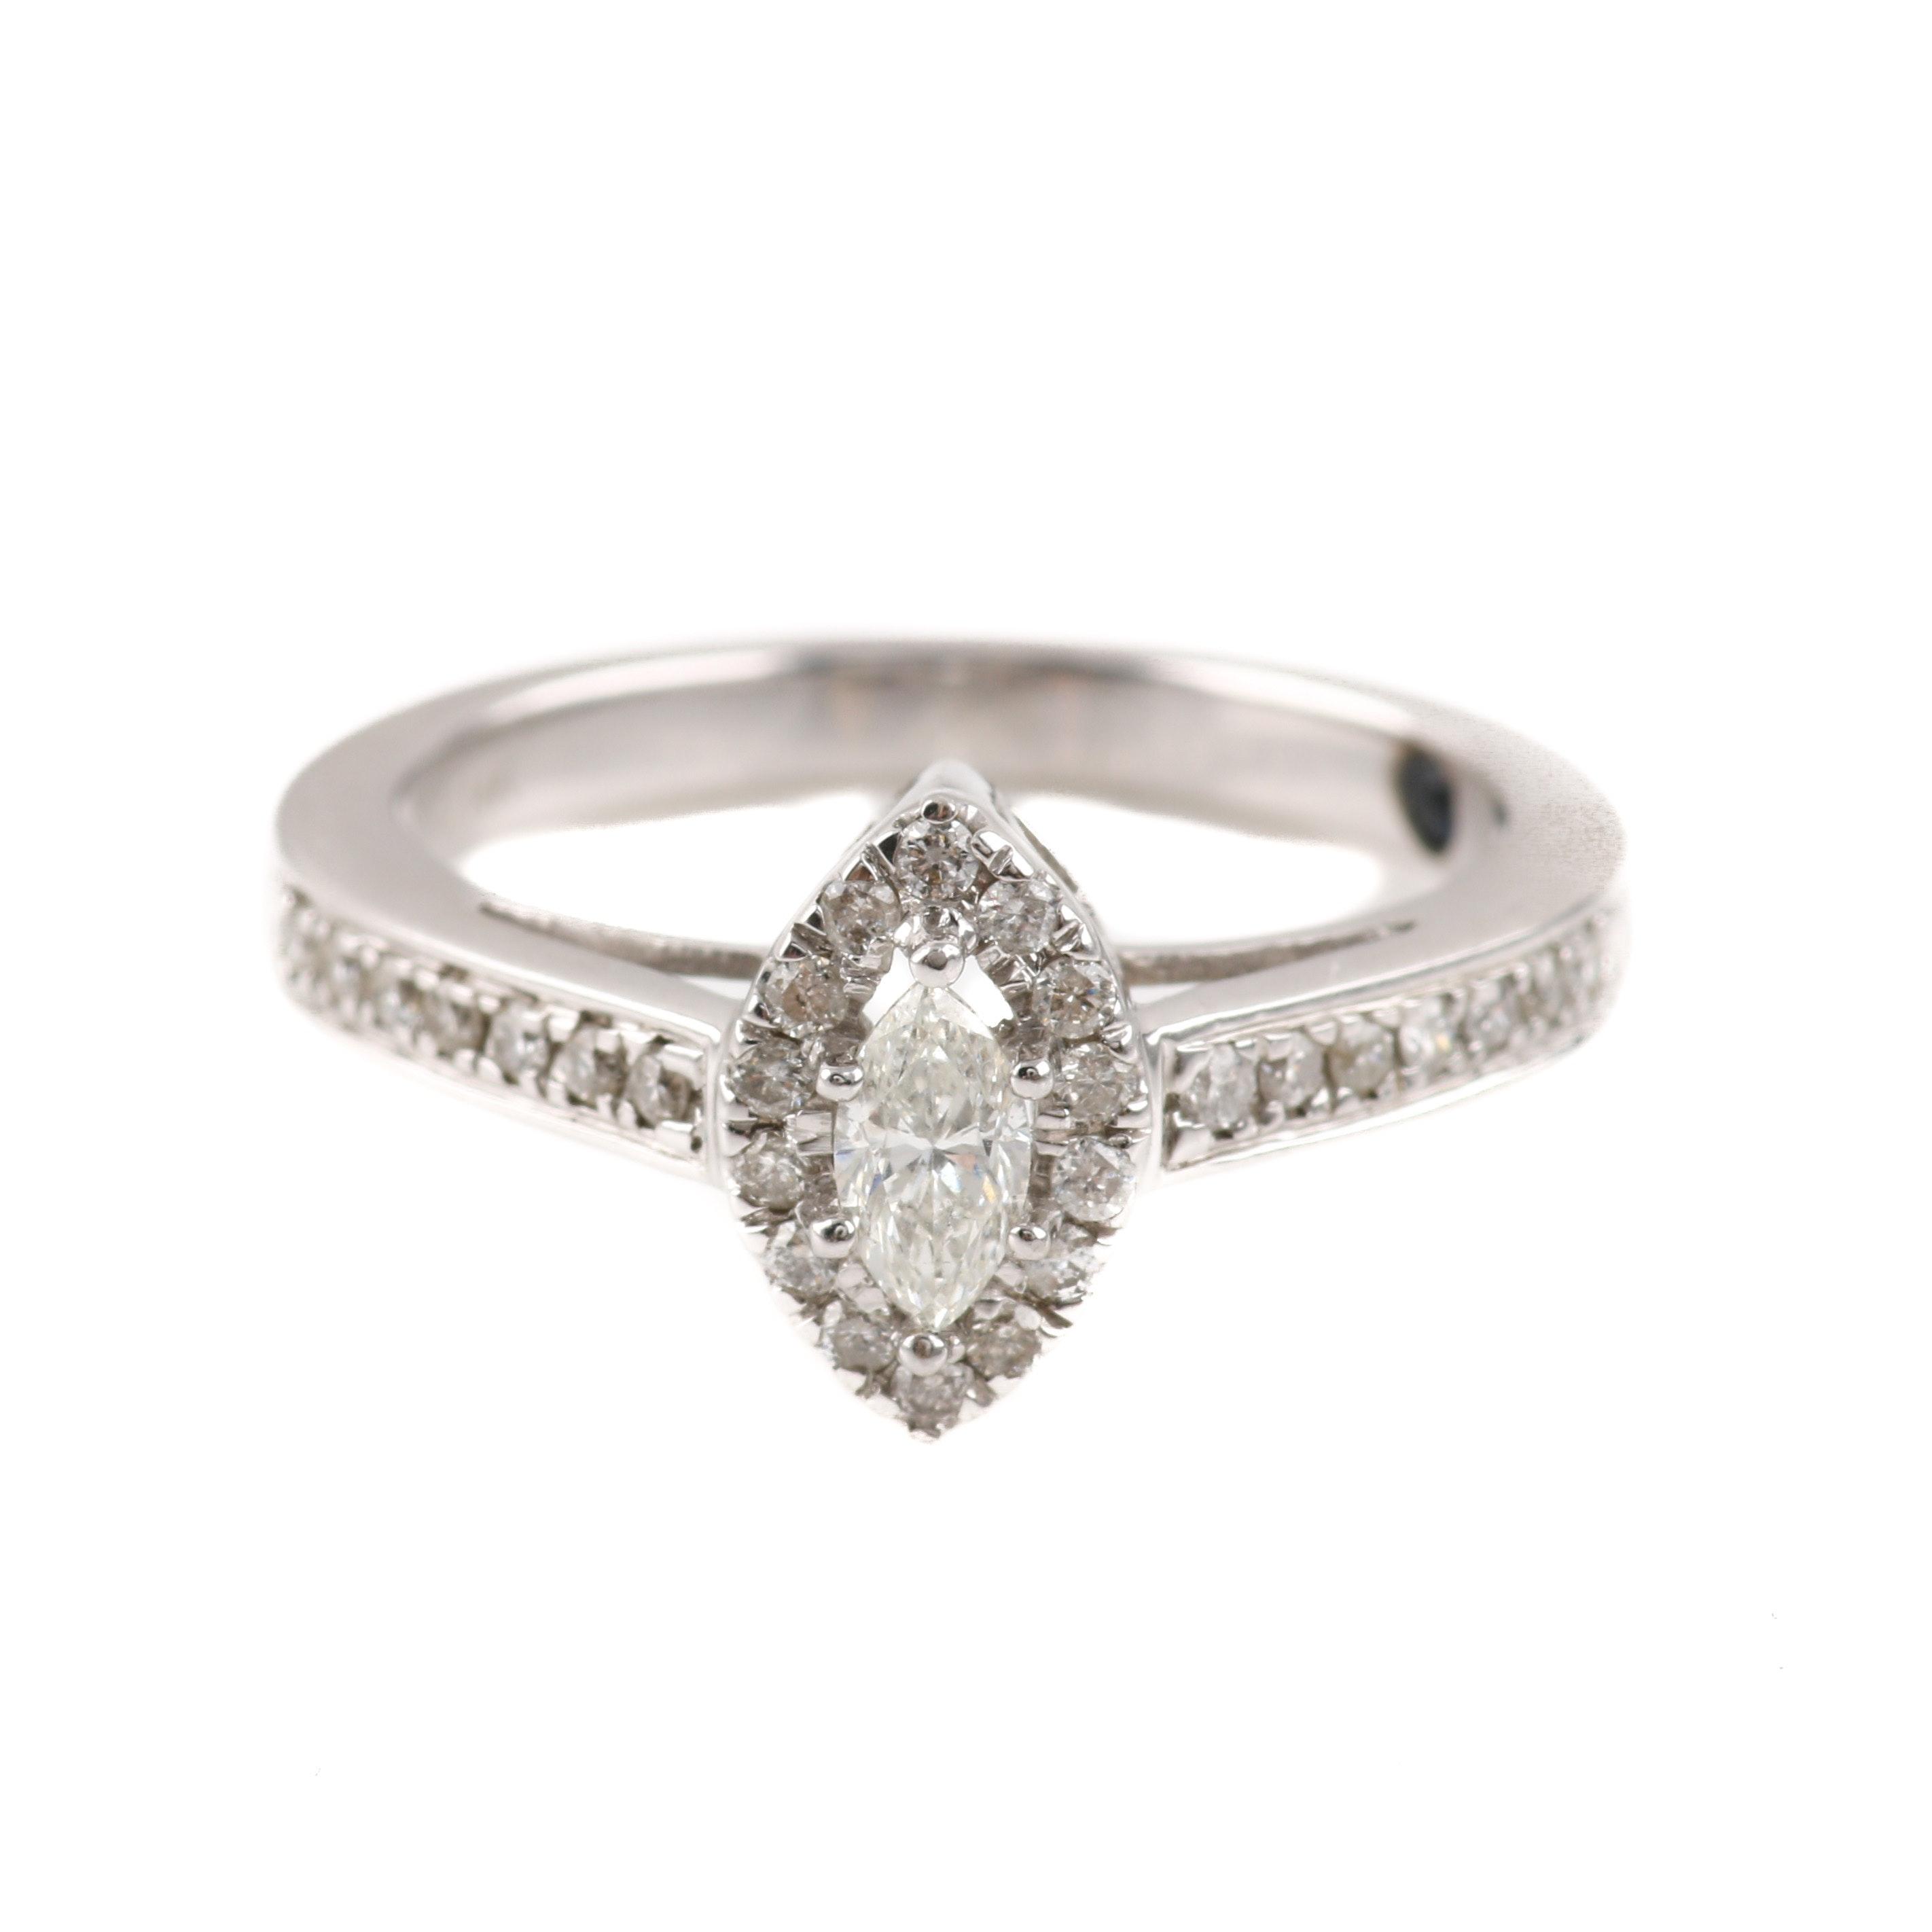 14K White Gold Marquise Diamond Ring